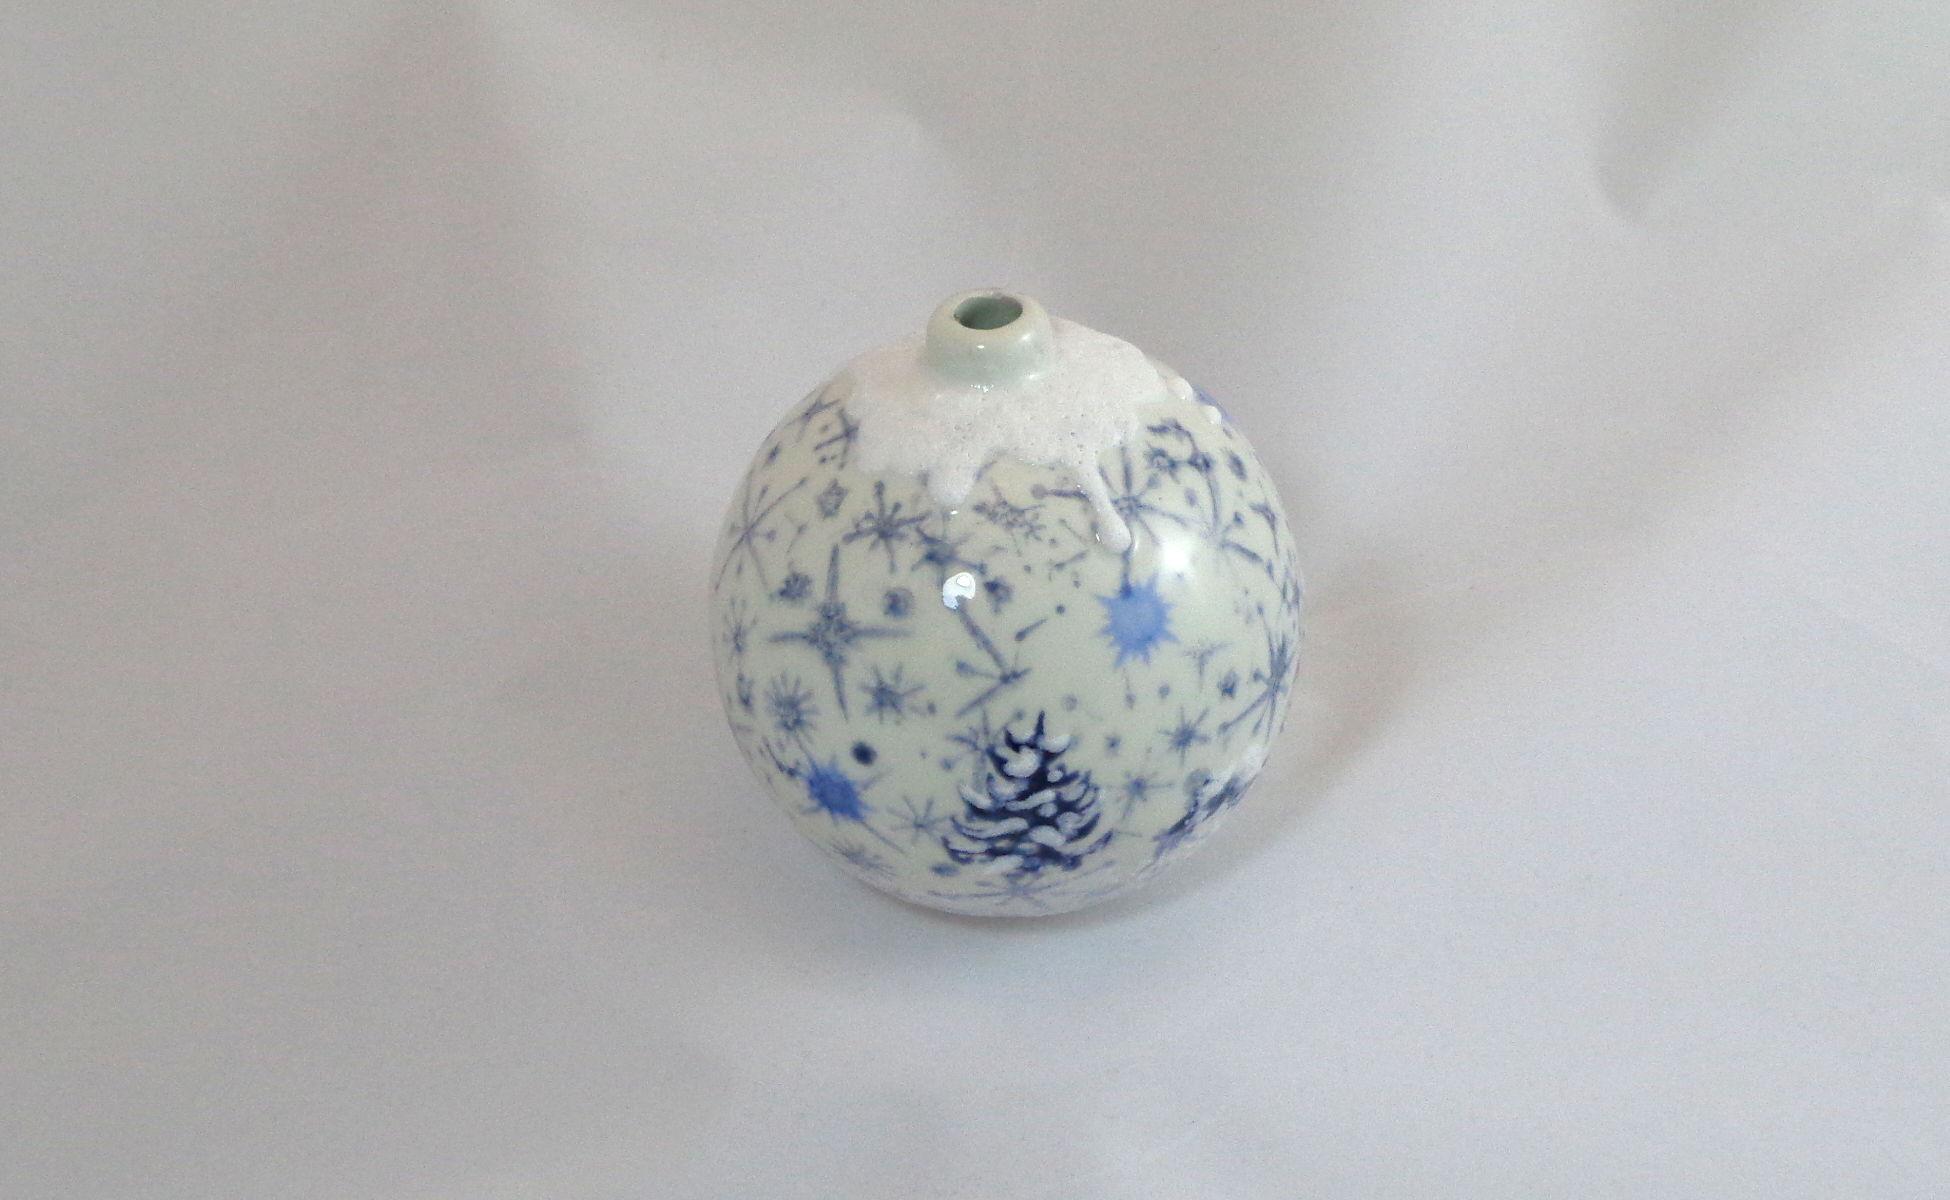 Bemalte Keramik Weihnachtskugel Schneelandschaft